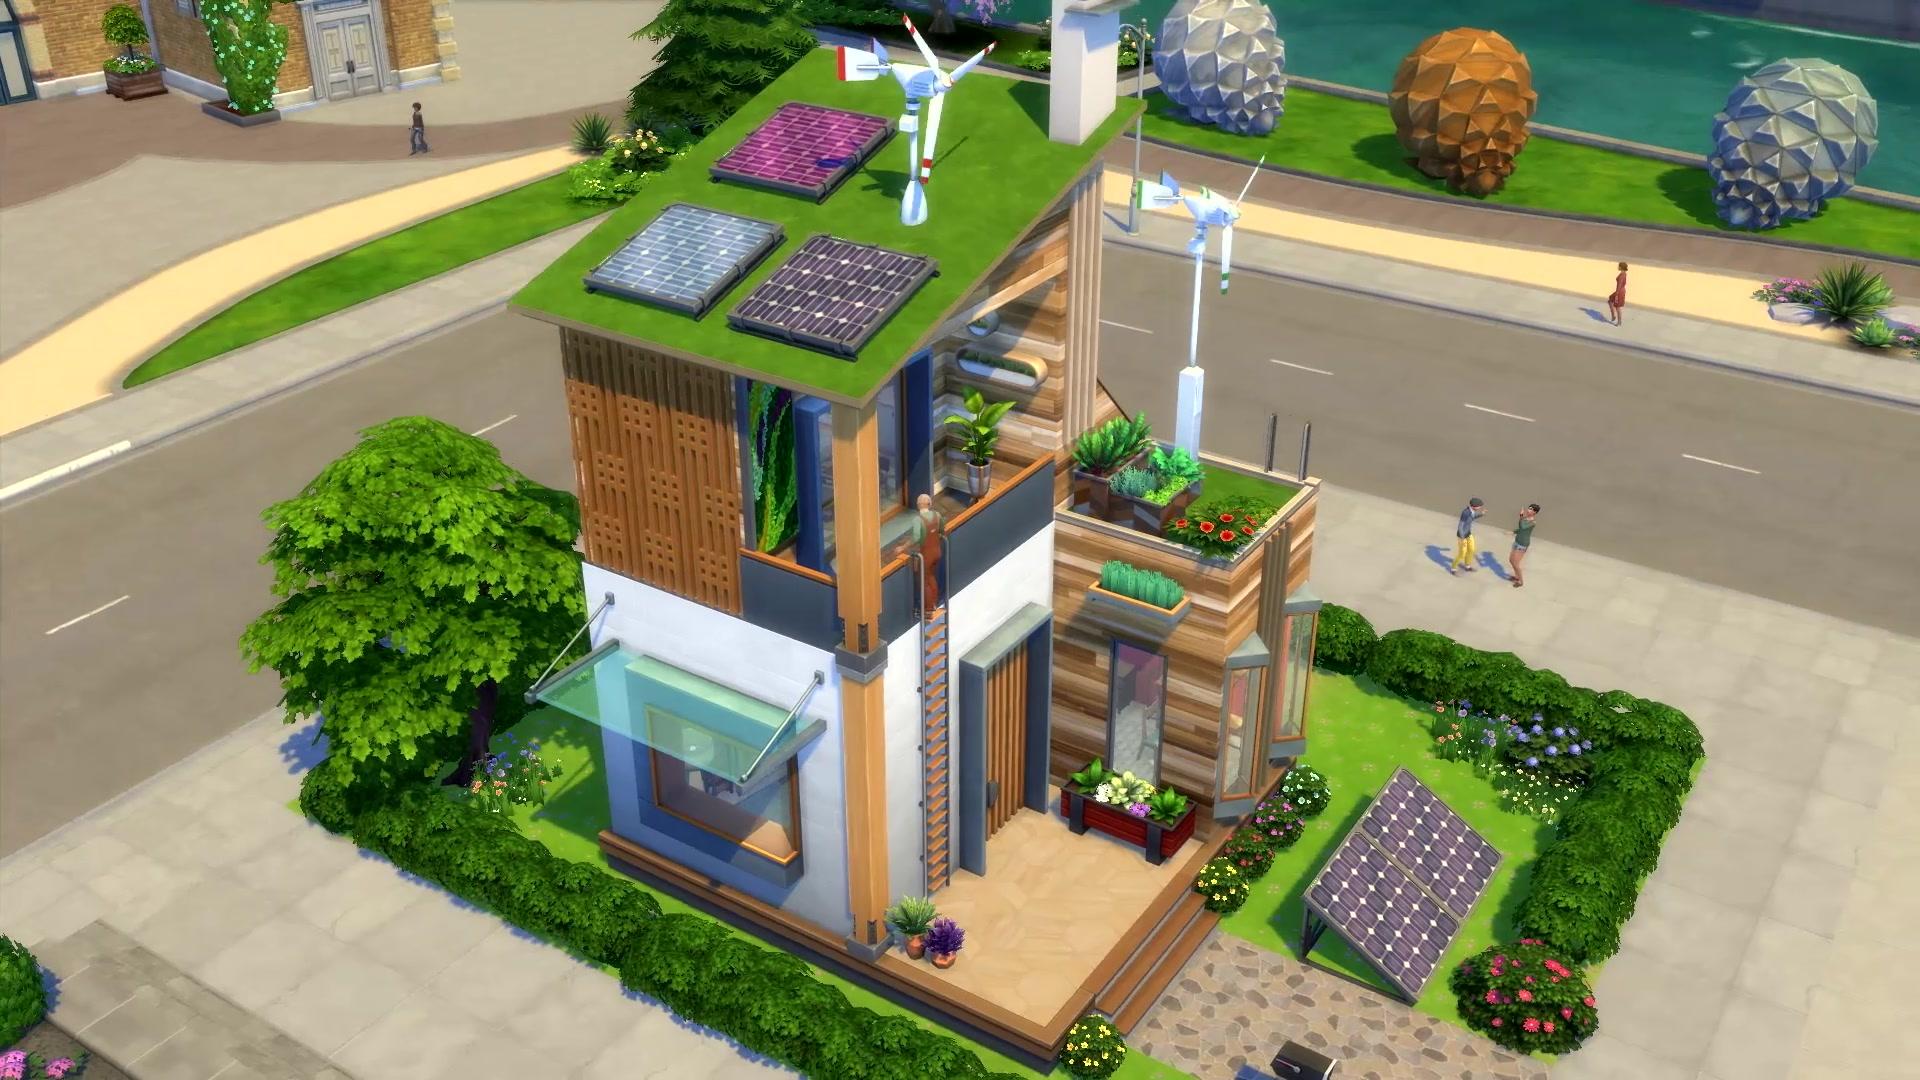 The Sims 4 Eco Lifestyle - The Sim Architect